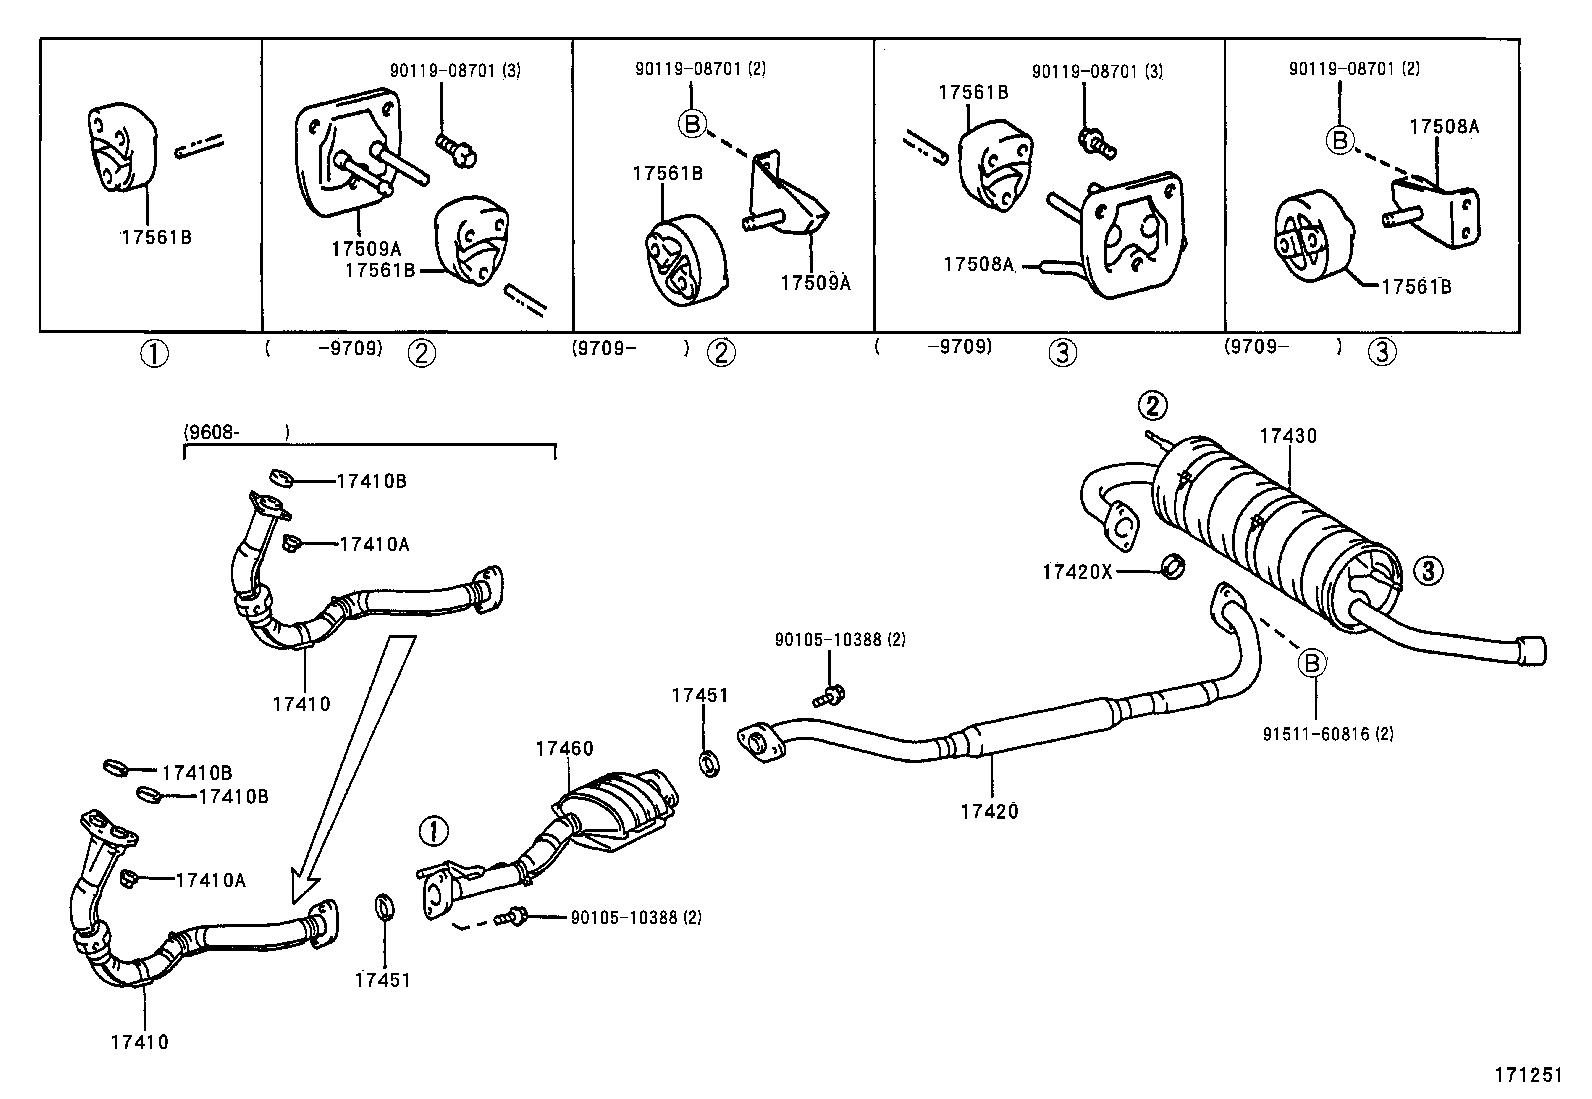 2001 Rav4 Exhaust System Diagram Manual Guide Wiring. Toyota Rav4sxa11r Awpgkw Tool Engine Fuel Exhaust Pipe Japan Rh Parts Eu Rav4. Toyota. 1997 Toyota Rav4 Manual Transmission Diagram At Scoala.co